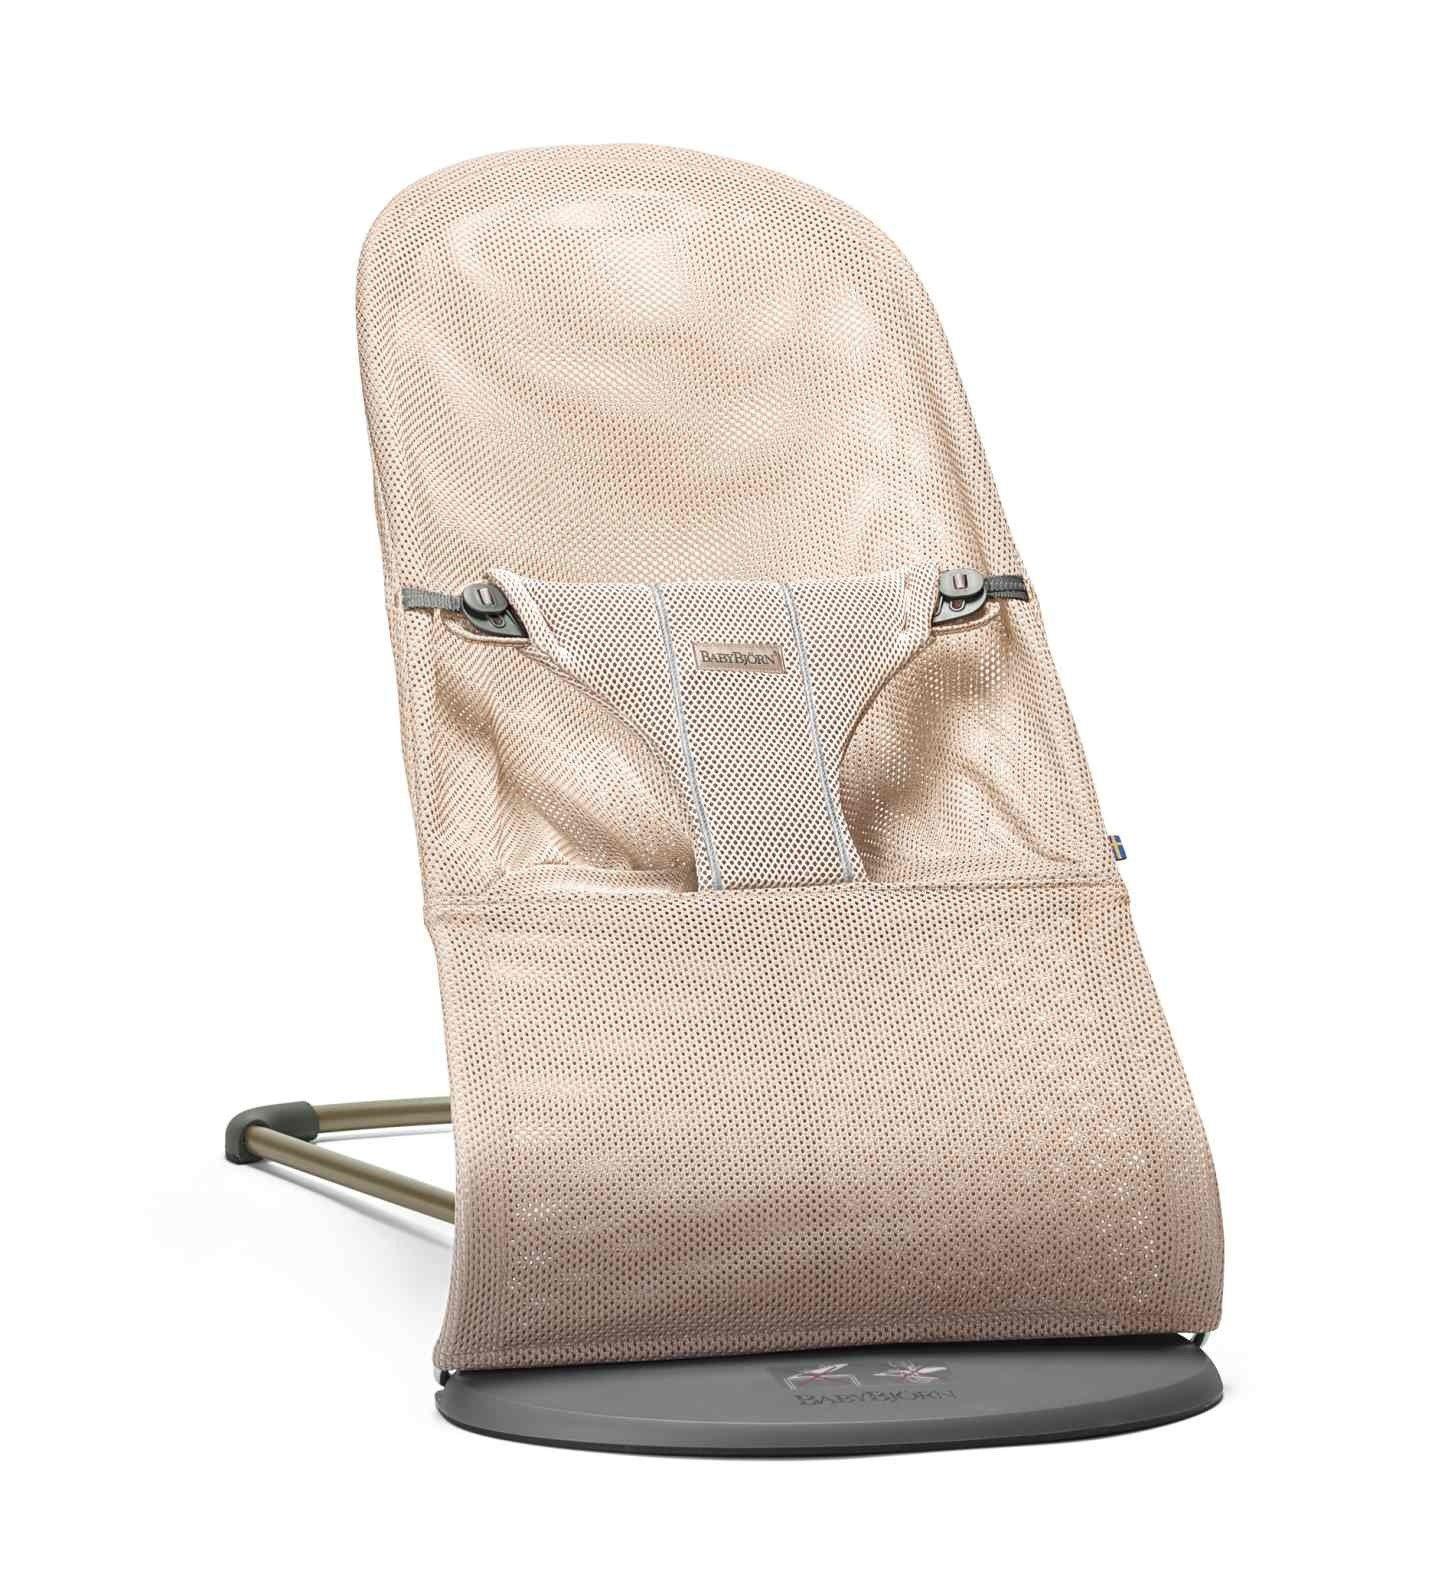 BABYBJORN - leżaczek BLISS MESH - Perłowy Różowy